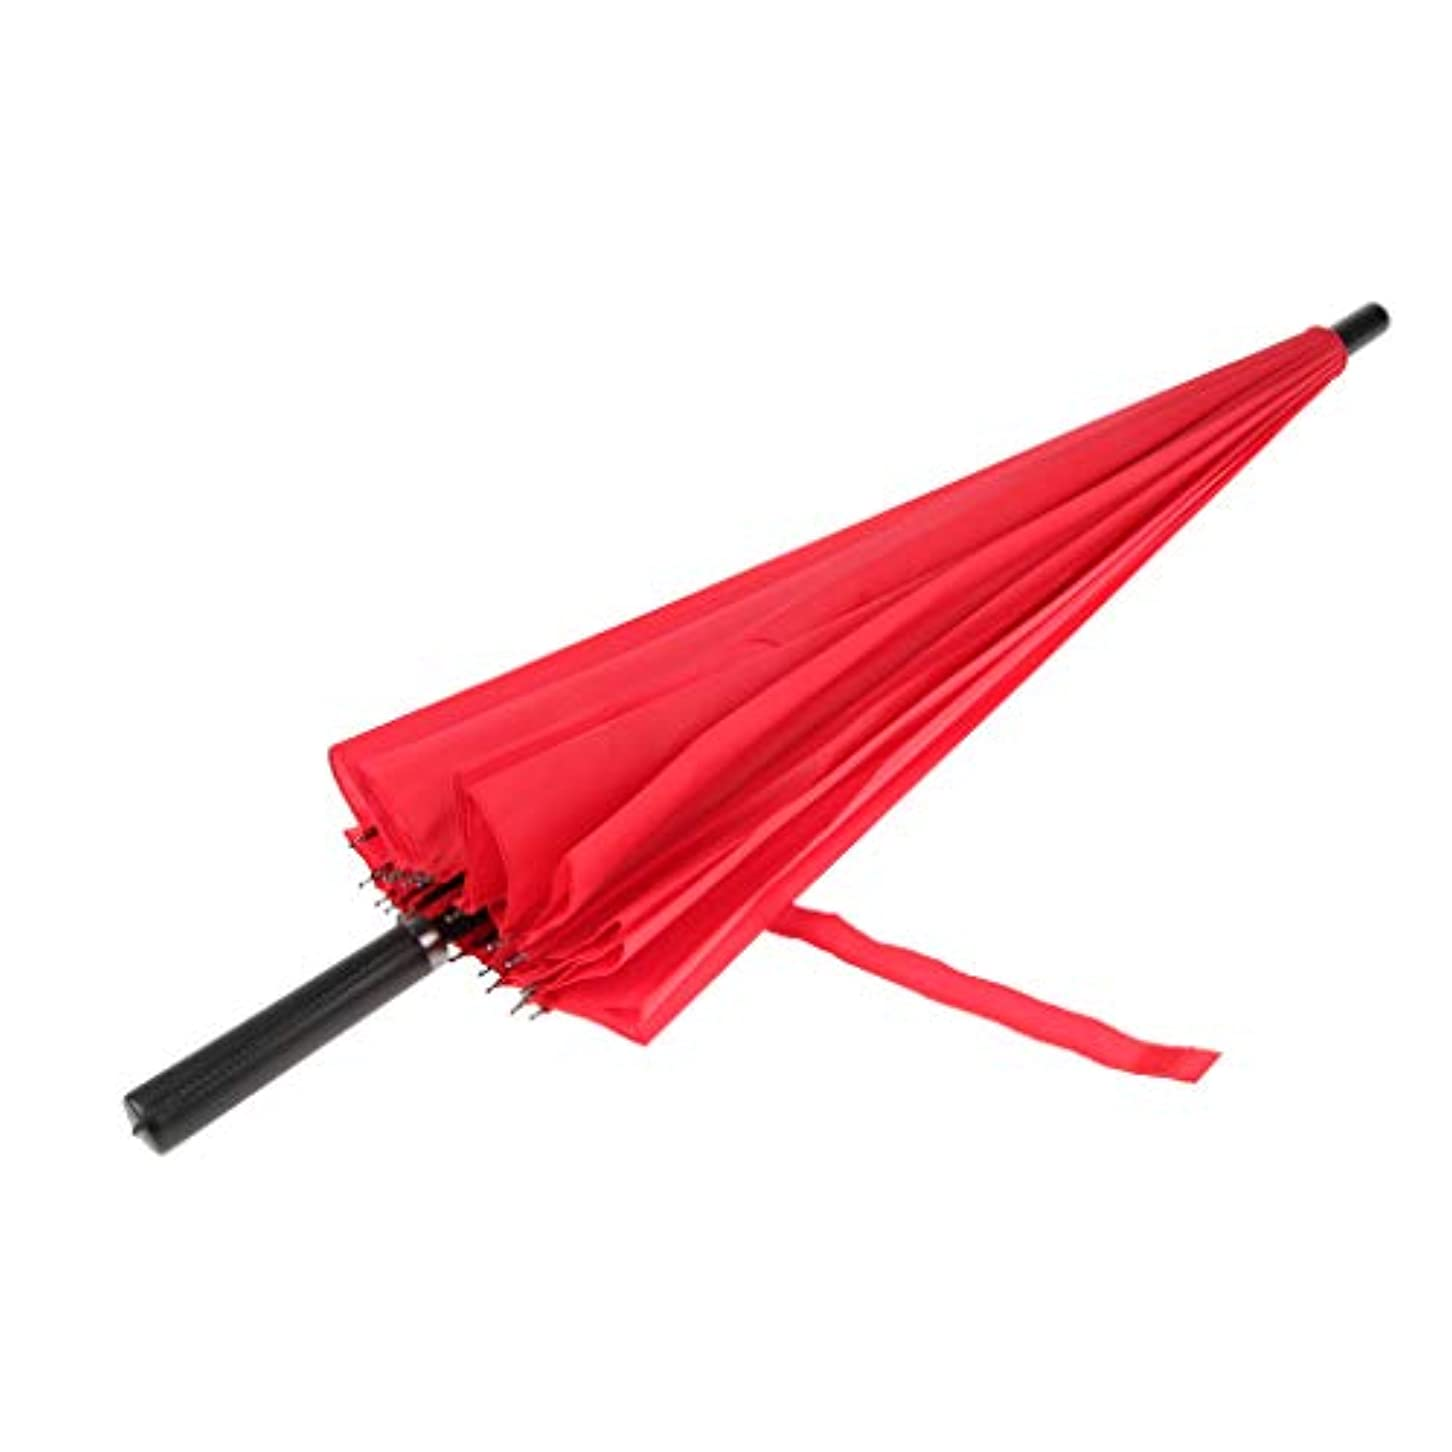 添付意欲頭痛雨 日傘 晴雨兼用 24本骨 UVカット スチール製 手開き 超大型 全6色 - 赤